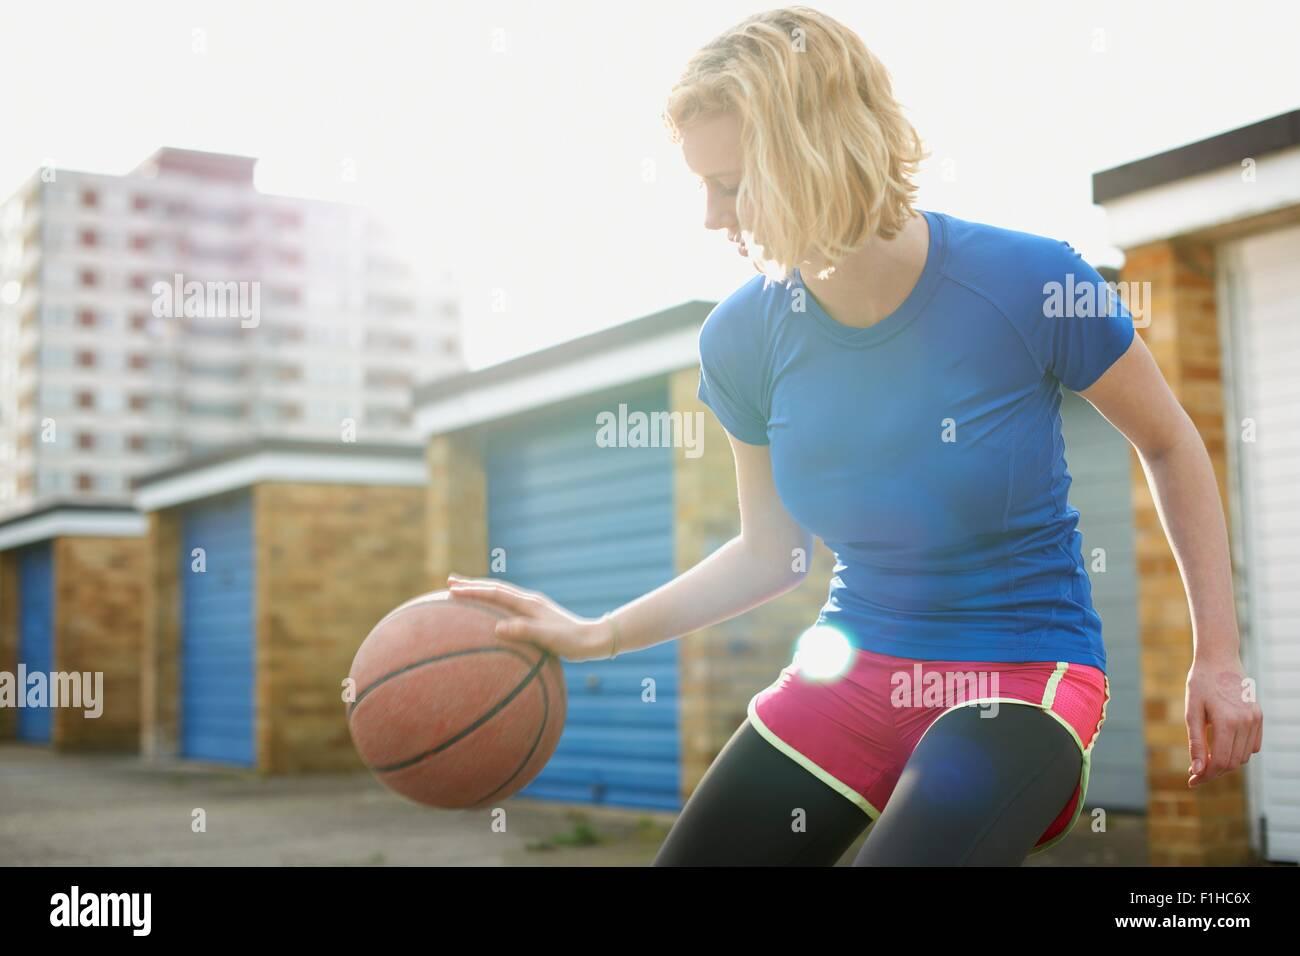 Portrait of woman bouncing basketball - Stock Image